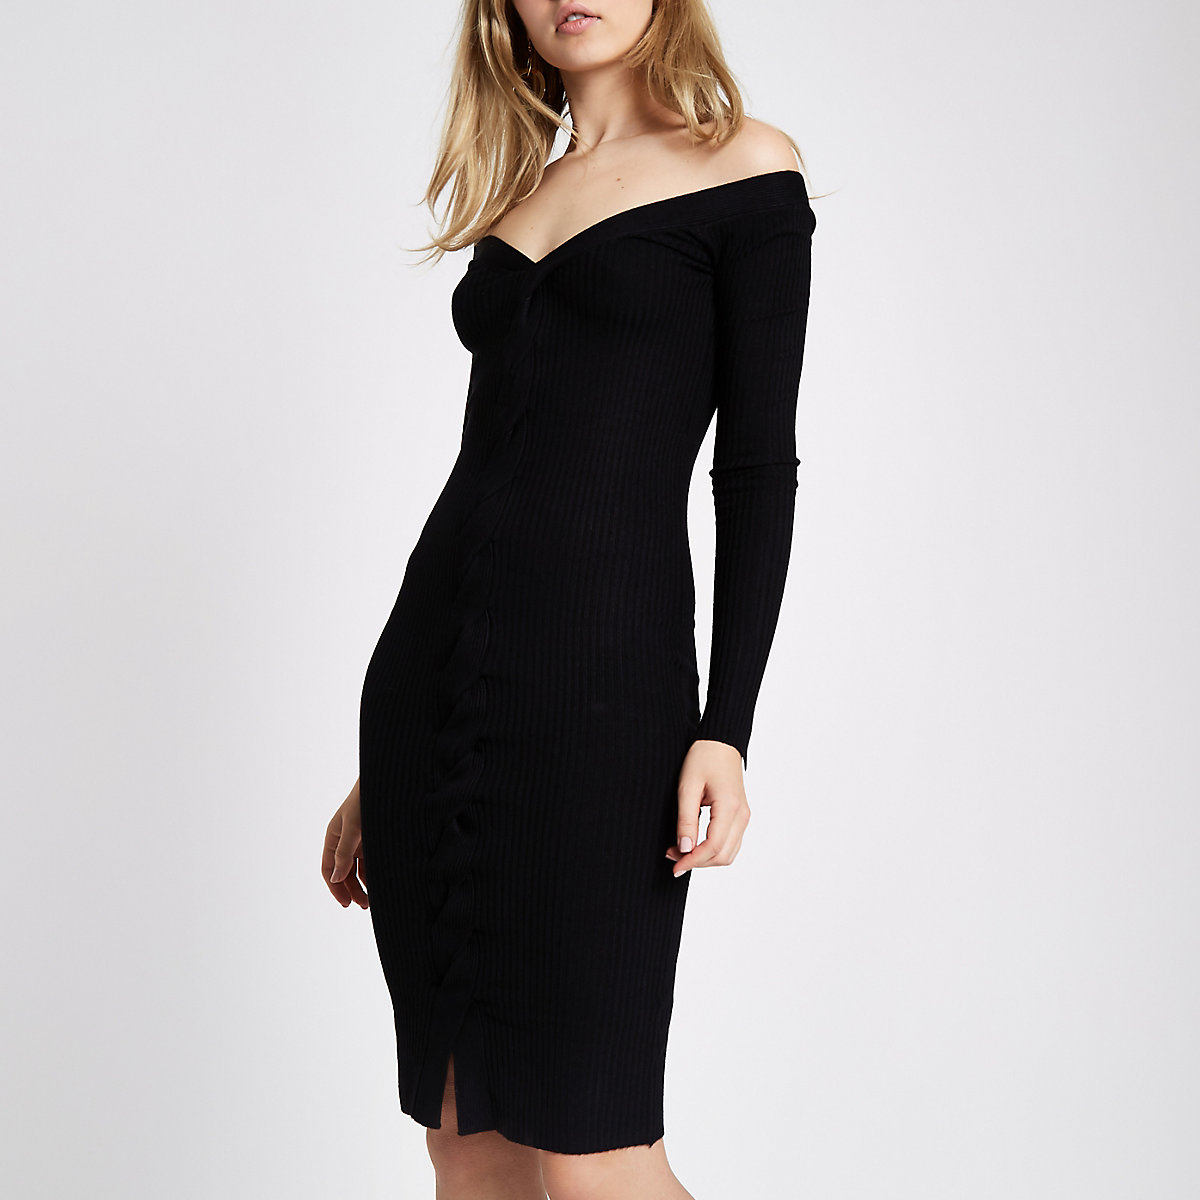 Black cable knit cut out midi dress